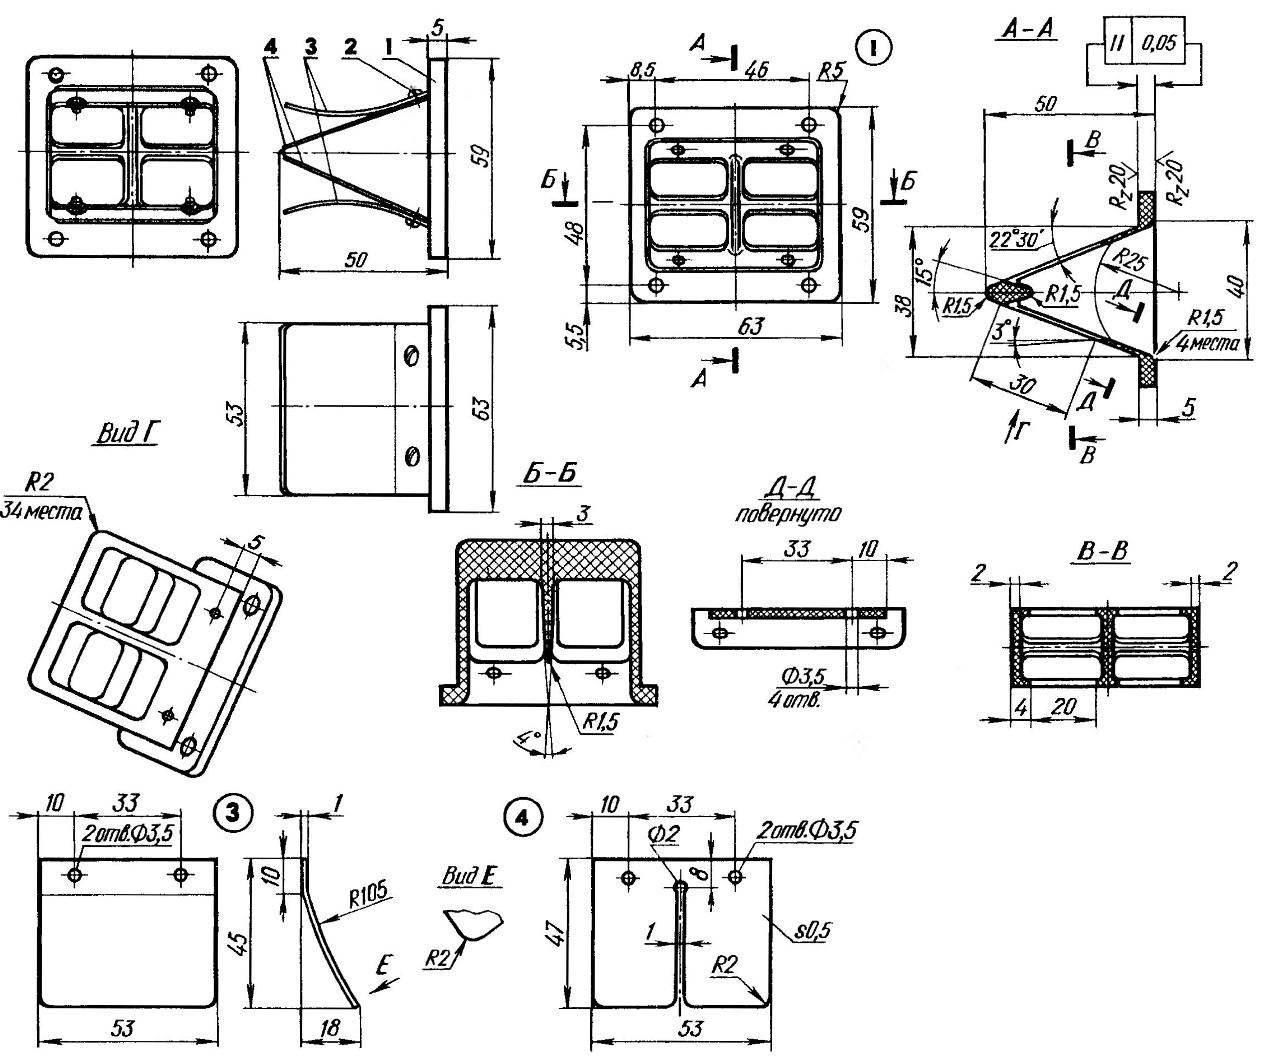 Рис. 8. Пластинчатый клапан: 1 — седло клапана (органитили кевлар); 2 — болт М3 (4 шт.); 3 ограничитель (сталь, 2 шт.); 4 пластина клапана (стеклотекстолит СТЭФ-1, 2 шт.).